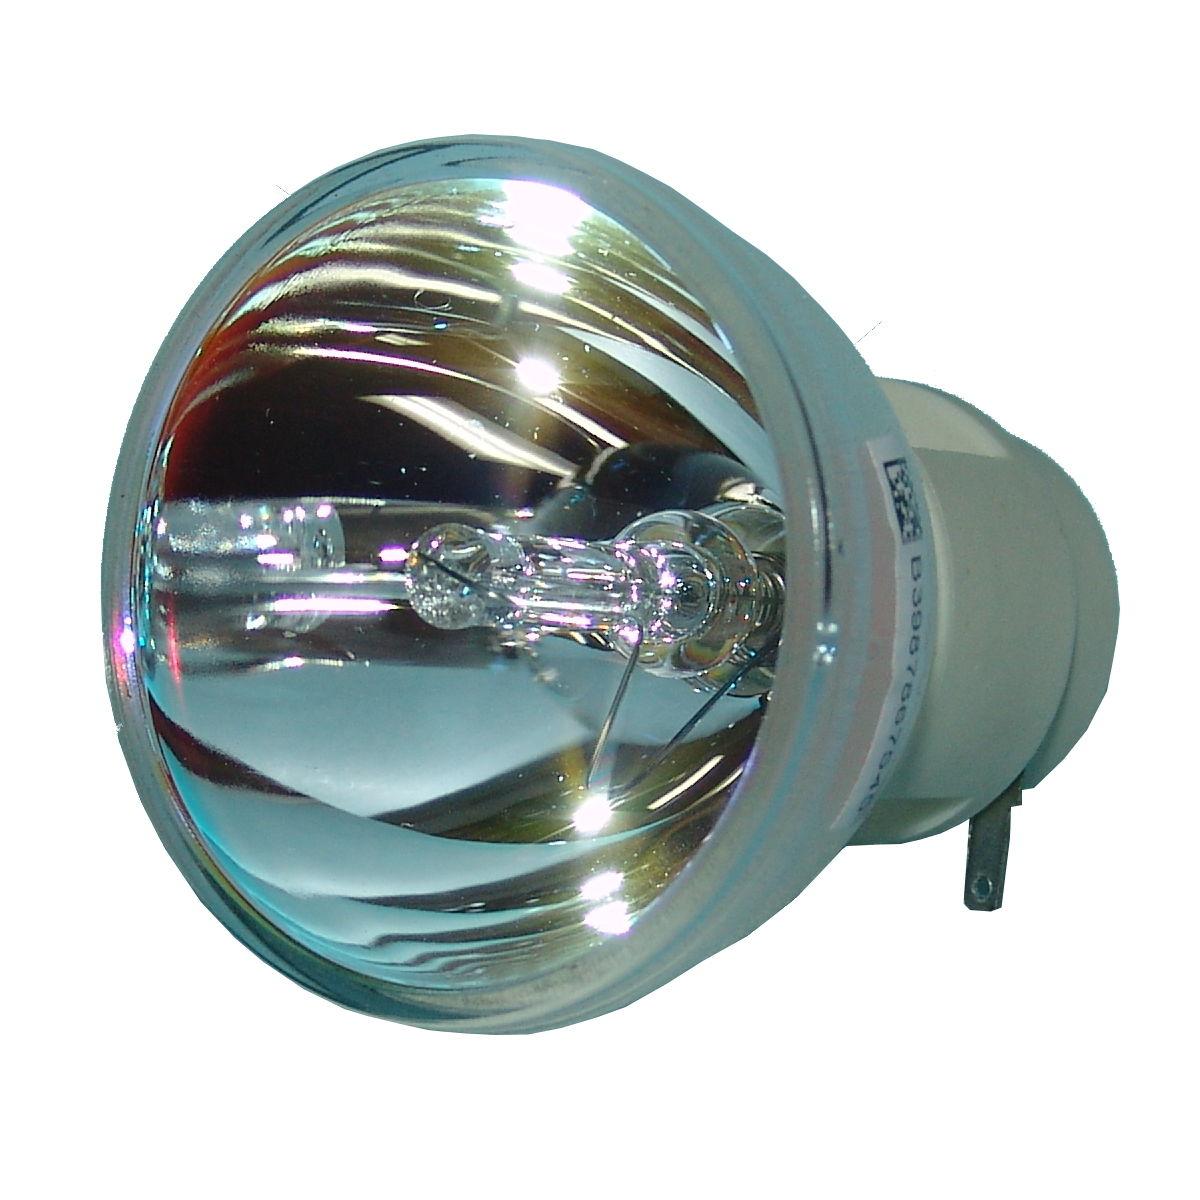 Compatible Bare Bulb RLC-078 for VIEWSONIC PJD5132 PJD5134 PJD5232L PJD5234L PJD6235 PJD6246 Projector Lamp Bulb without housing xim lisa lamps brand new replacement projector lamp rlc 078 with housing for viewsonic pjd5132 pjd5134 pjd5232l pjd5234l